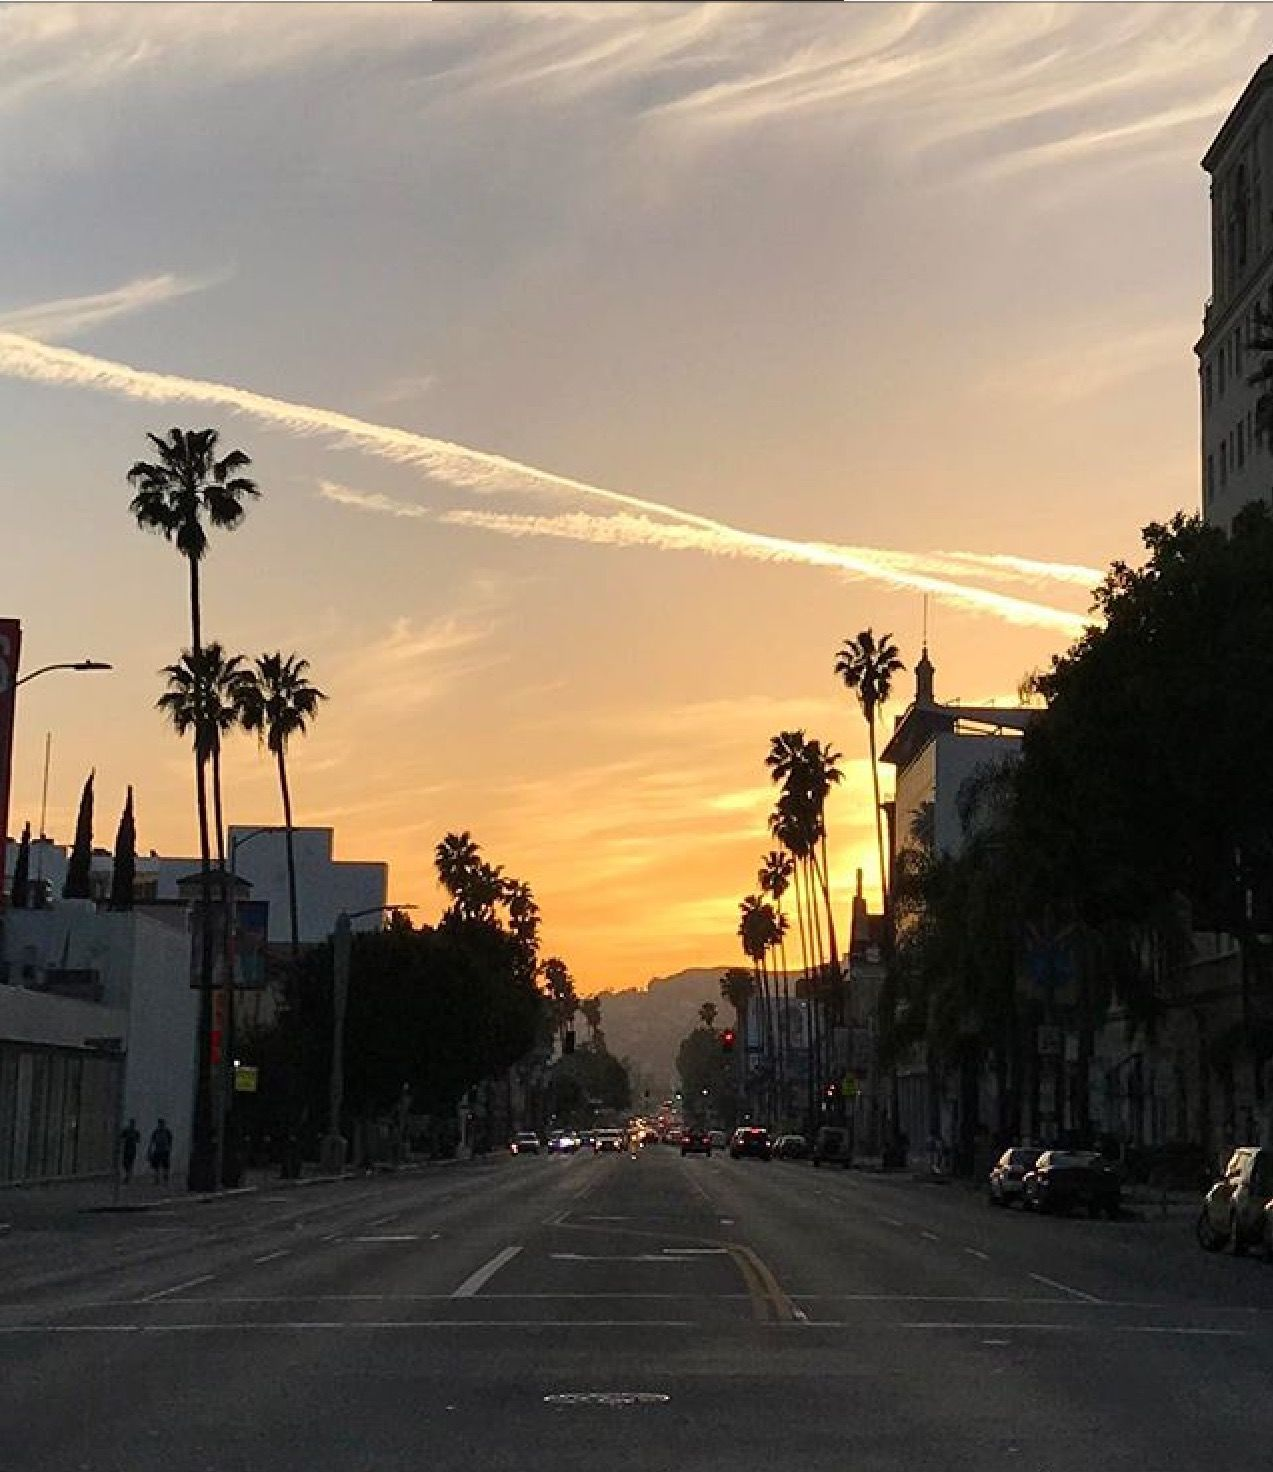 Wallpaper Los Angeles: 56 Best Free California Dope Wallpapers